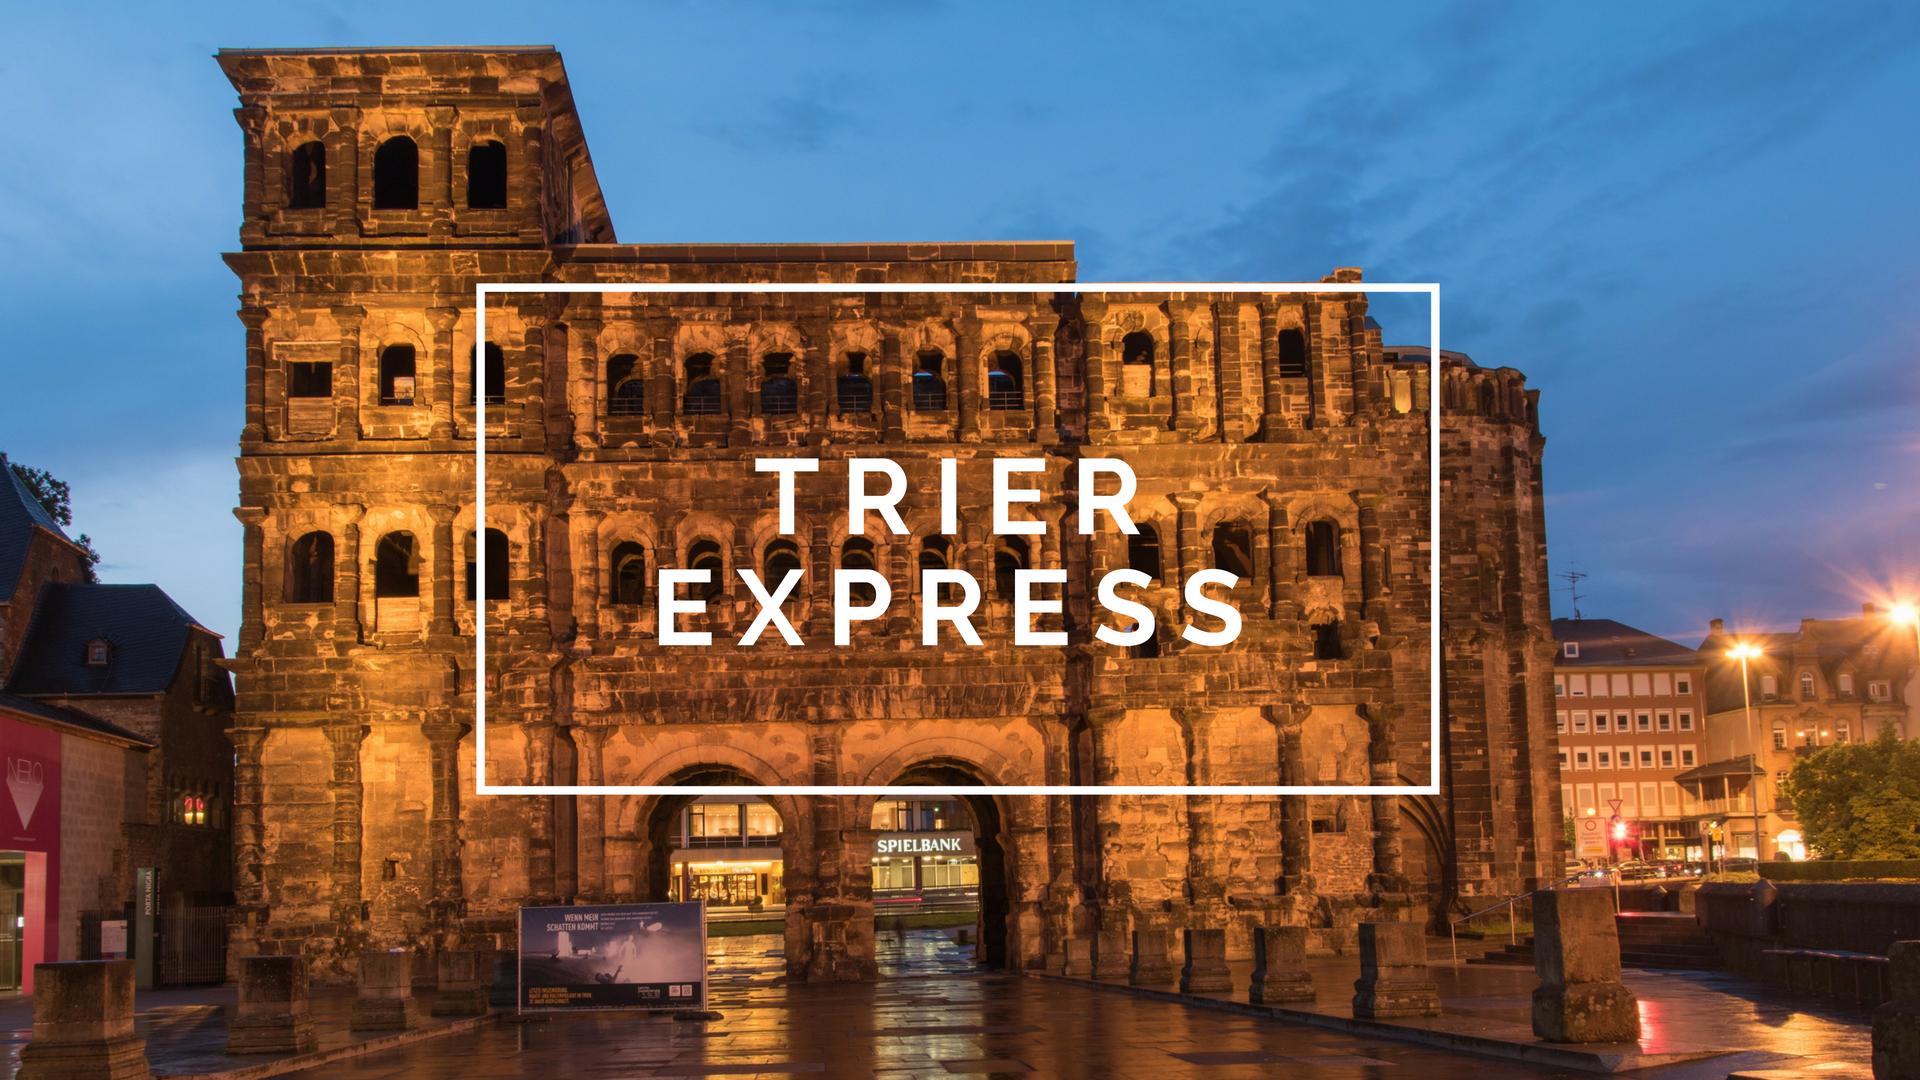 A Roman Excursion in Trier